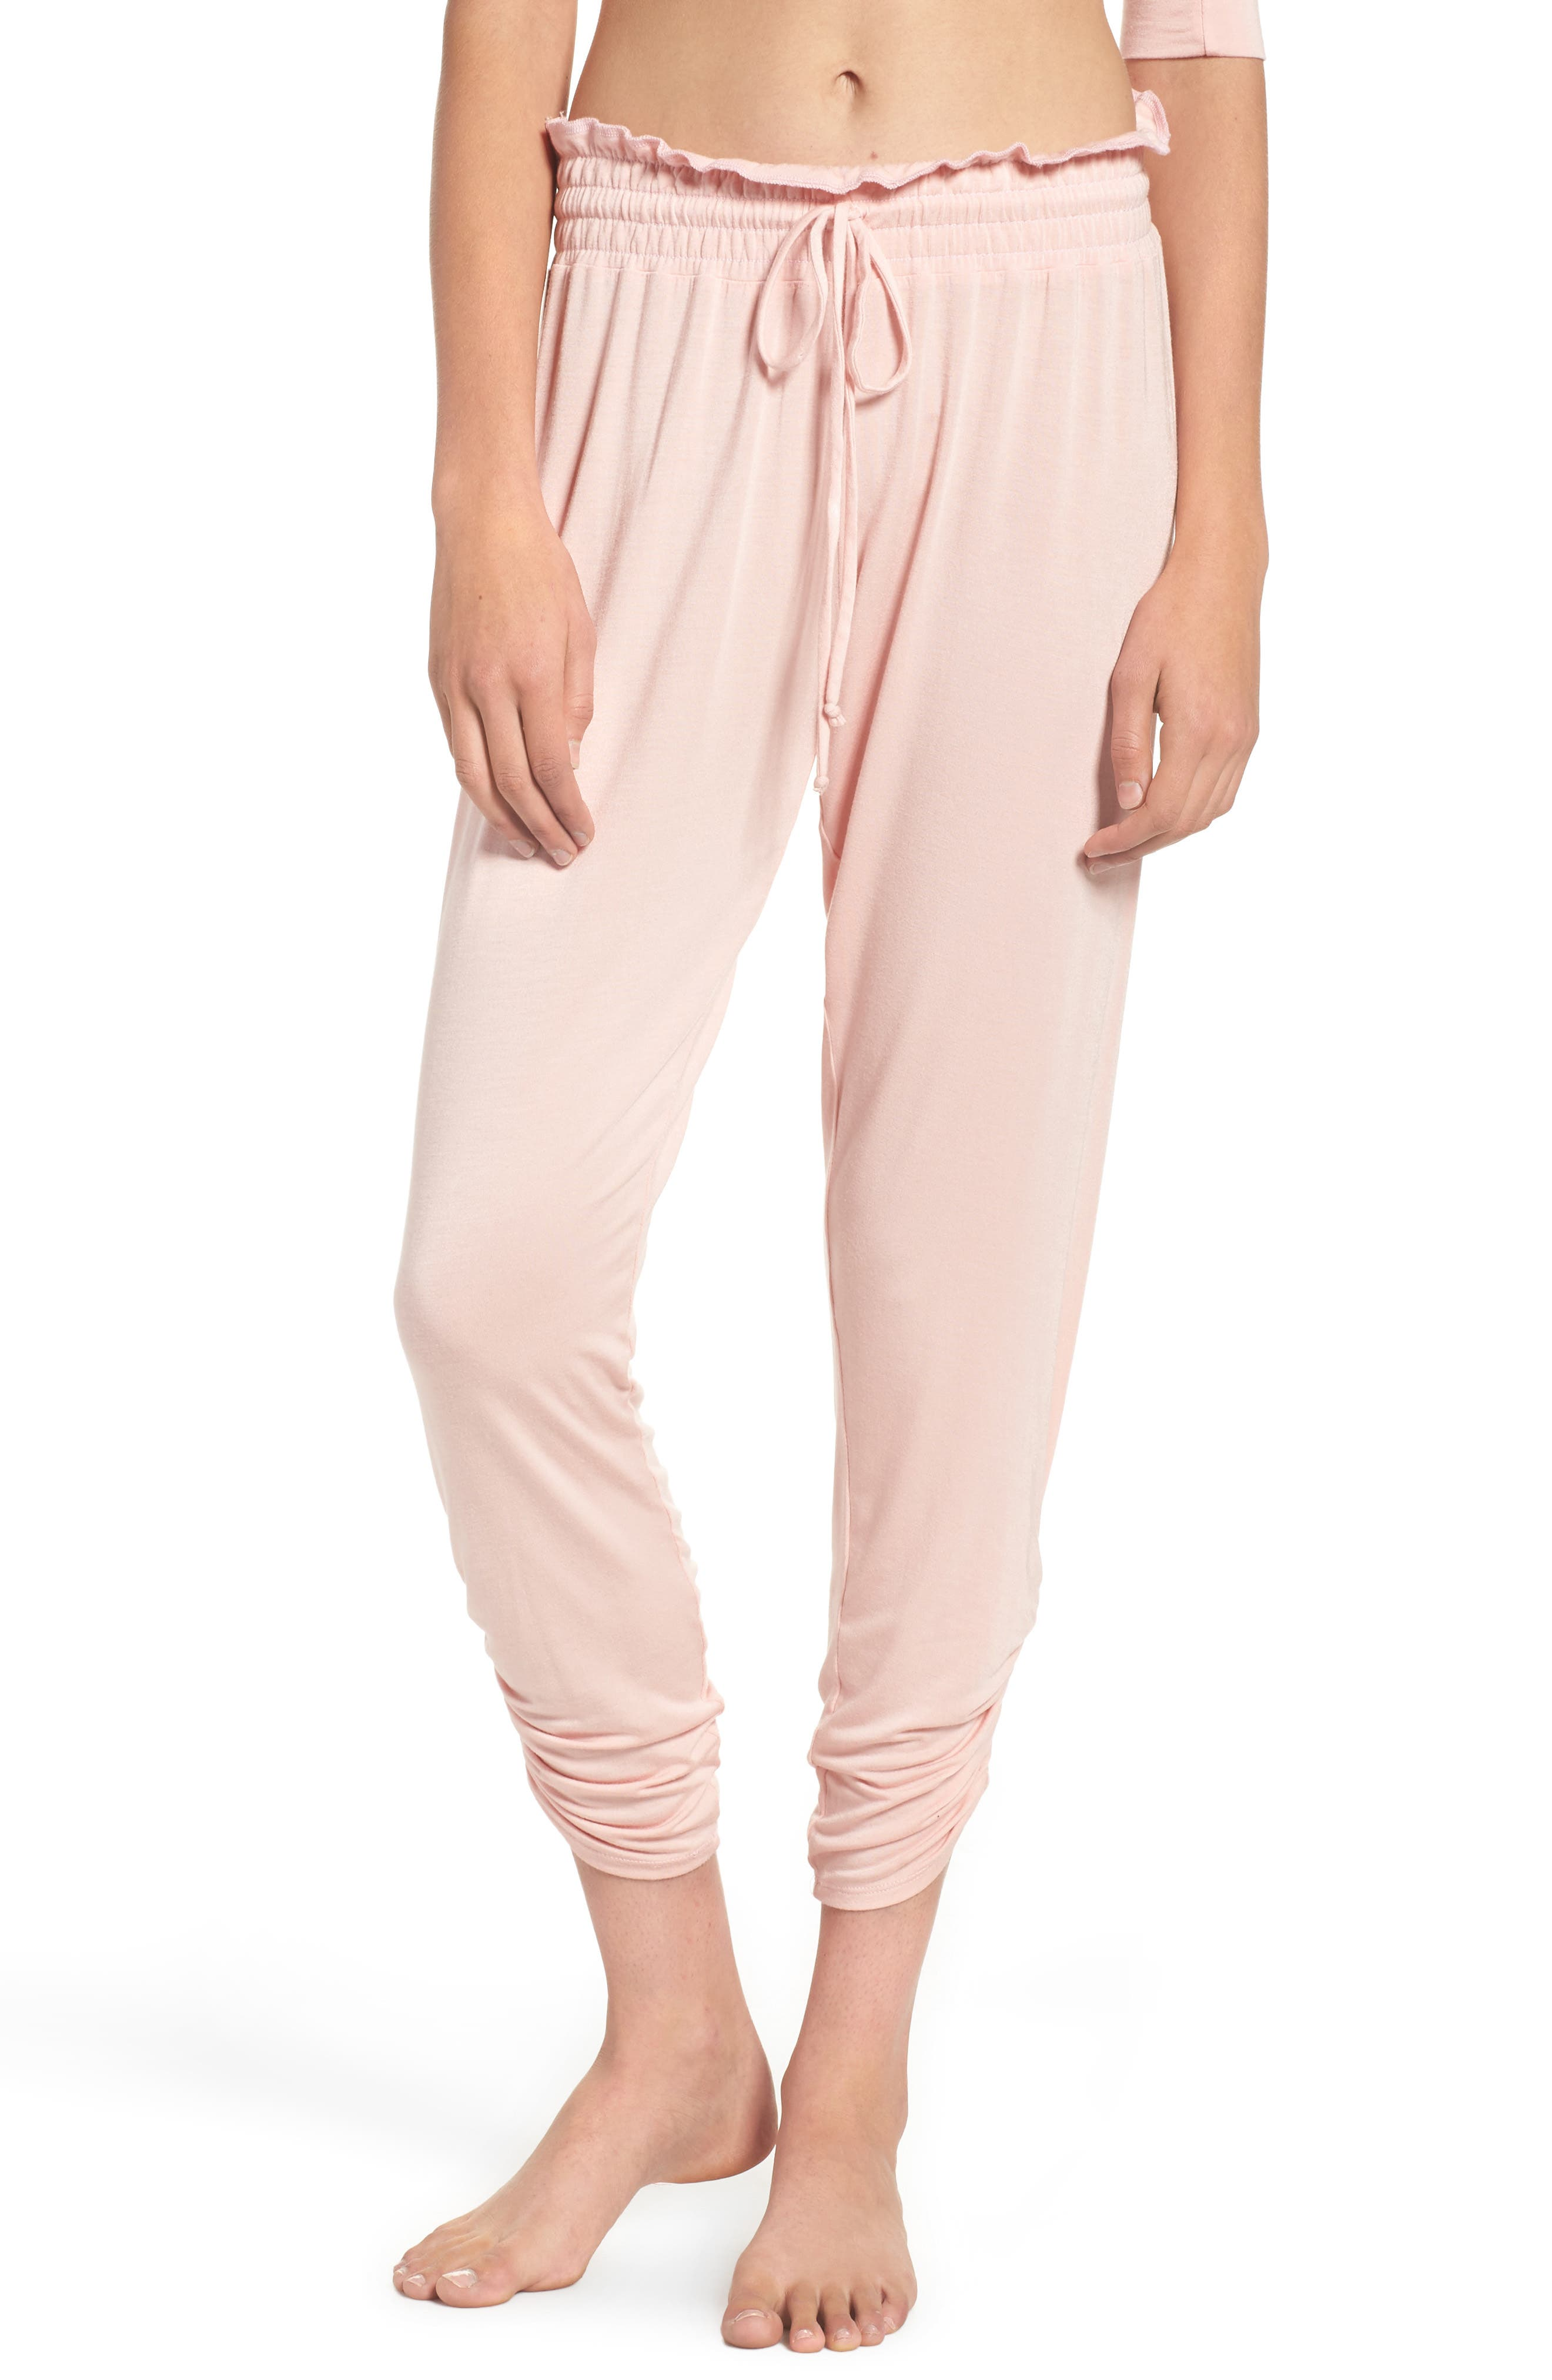 Bella Pants,                             Main thumbnail 1, color,                             Dream Pink